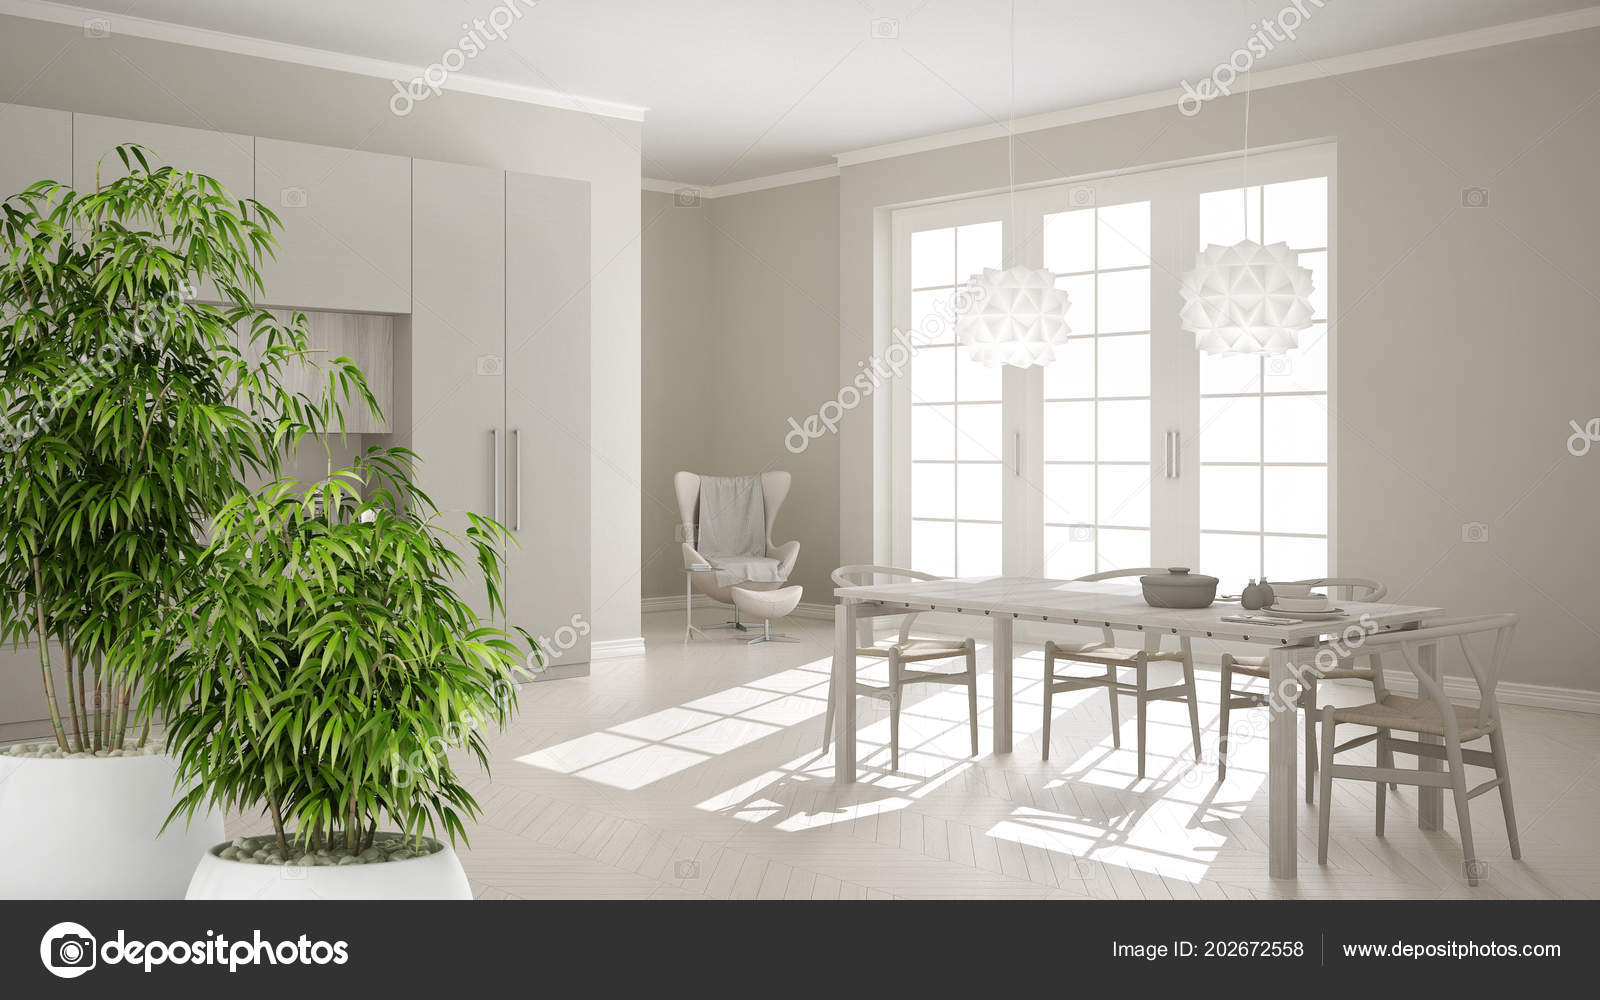 Zen Interior Potted Bamboo Plant Natural Interior Design Concept